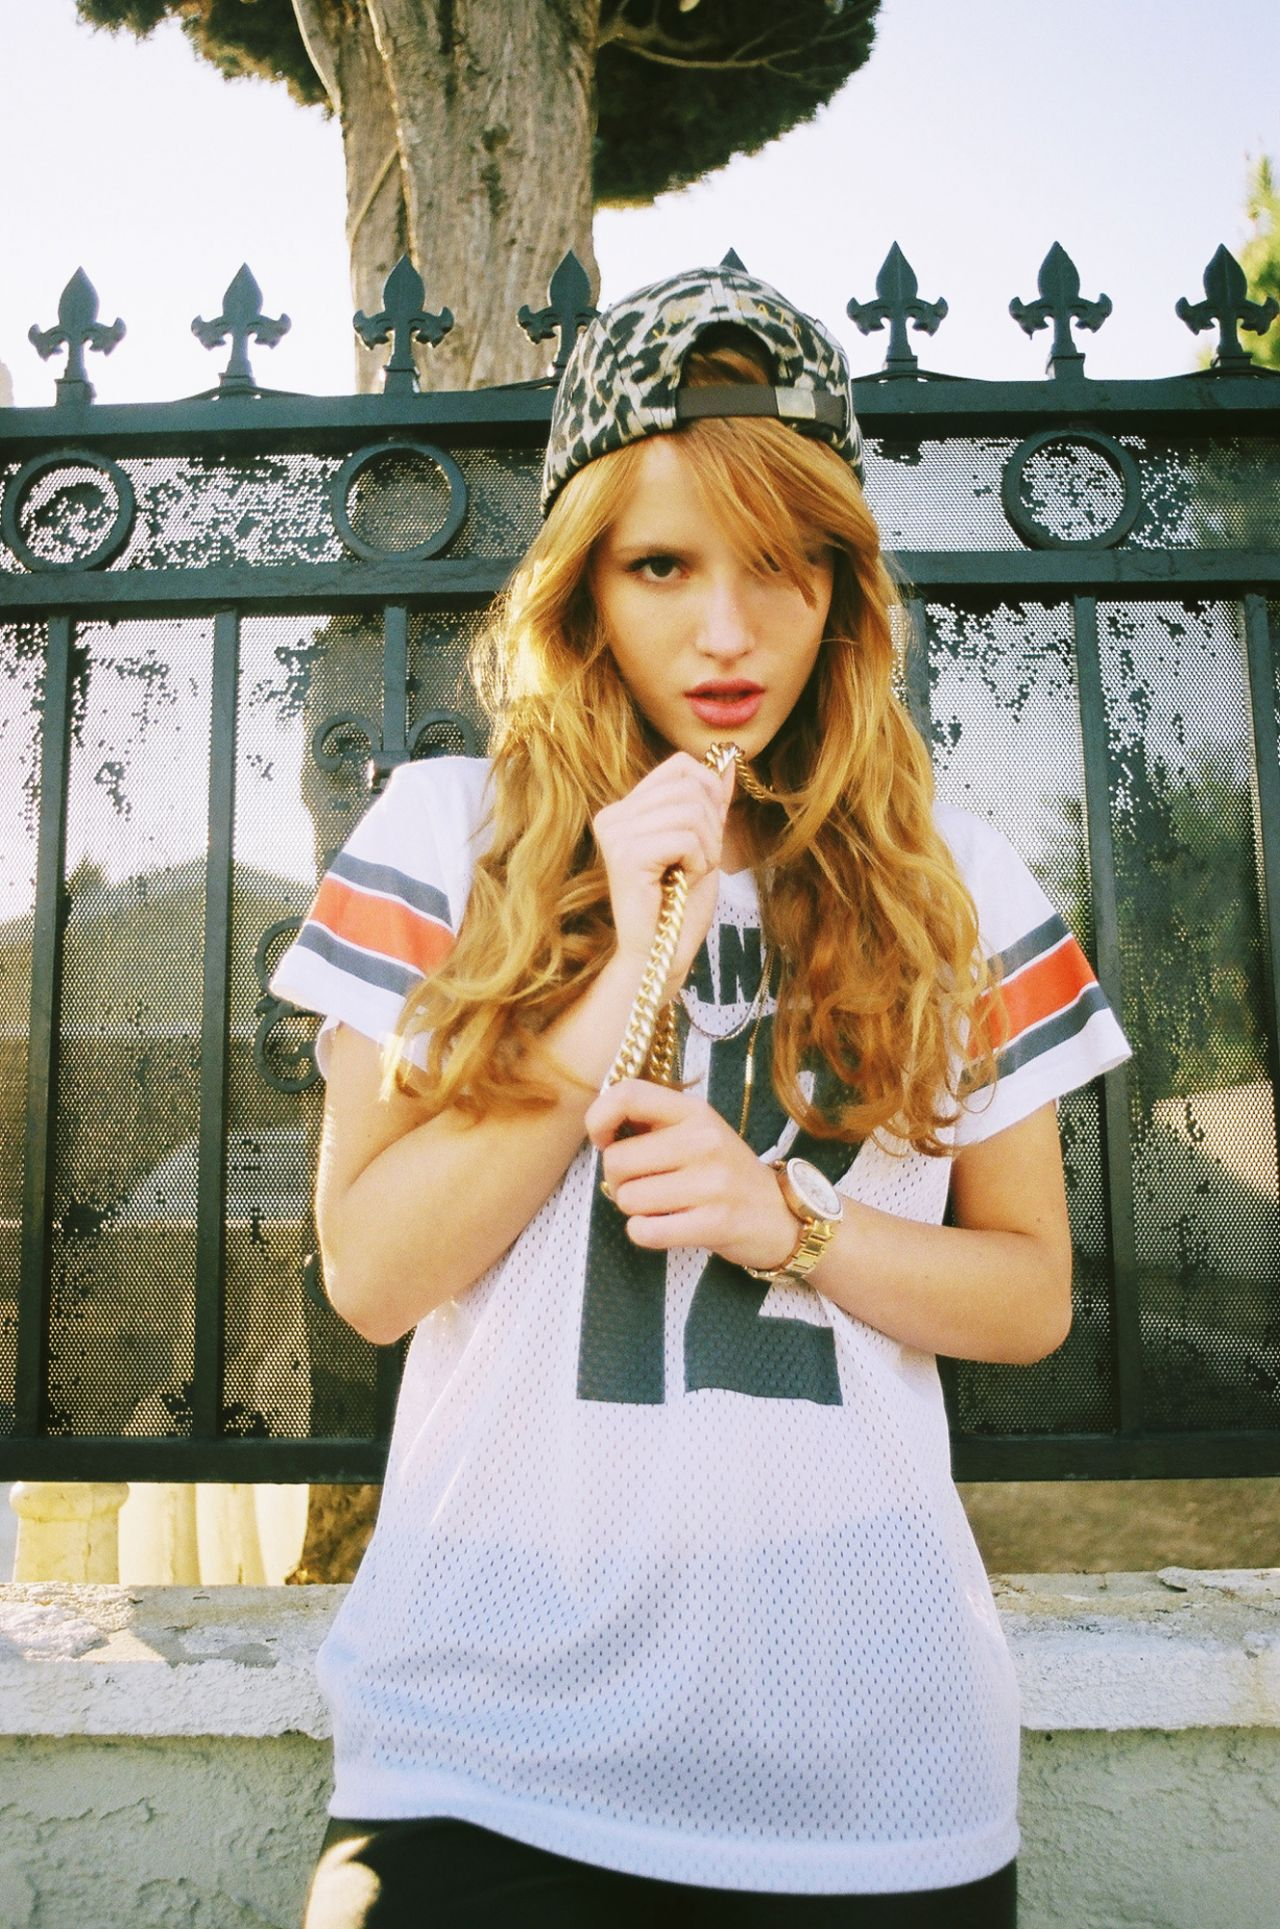 Bella Thorne 2014 Amber Asaly Photoshoot